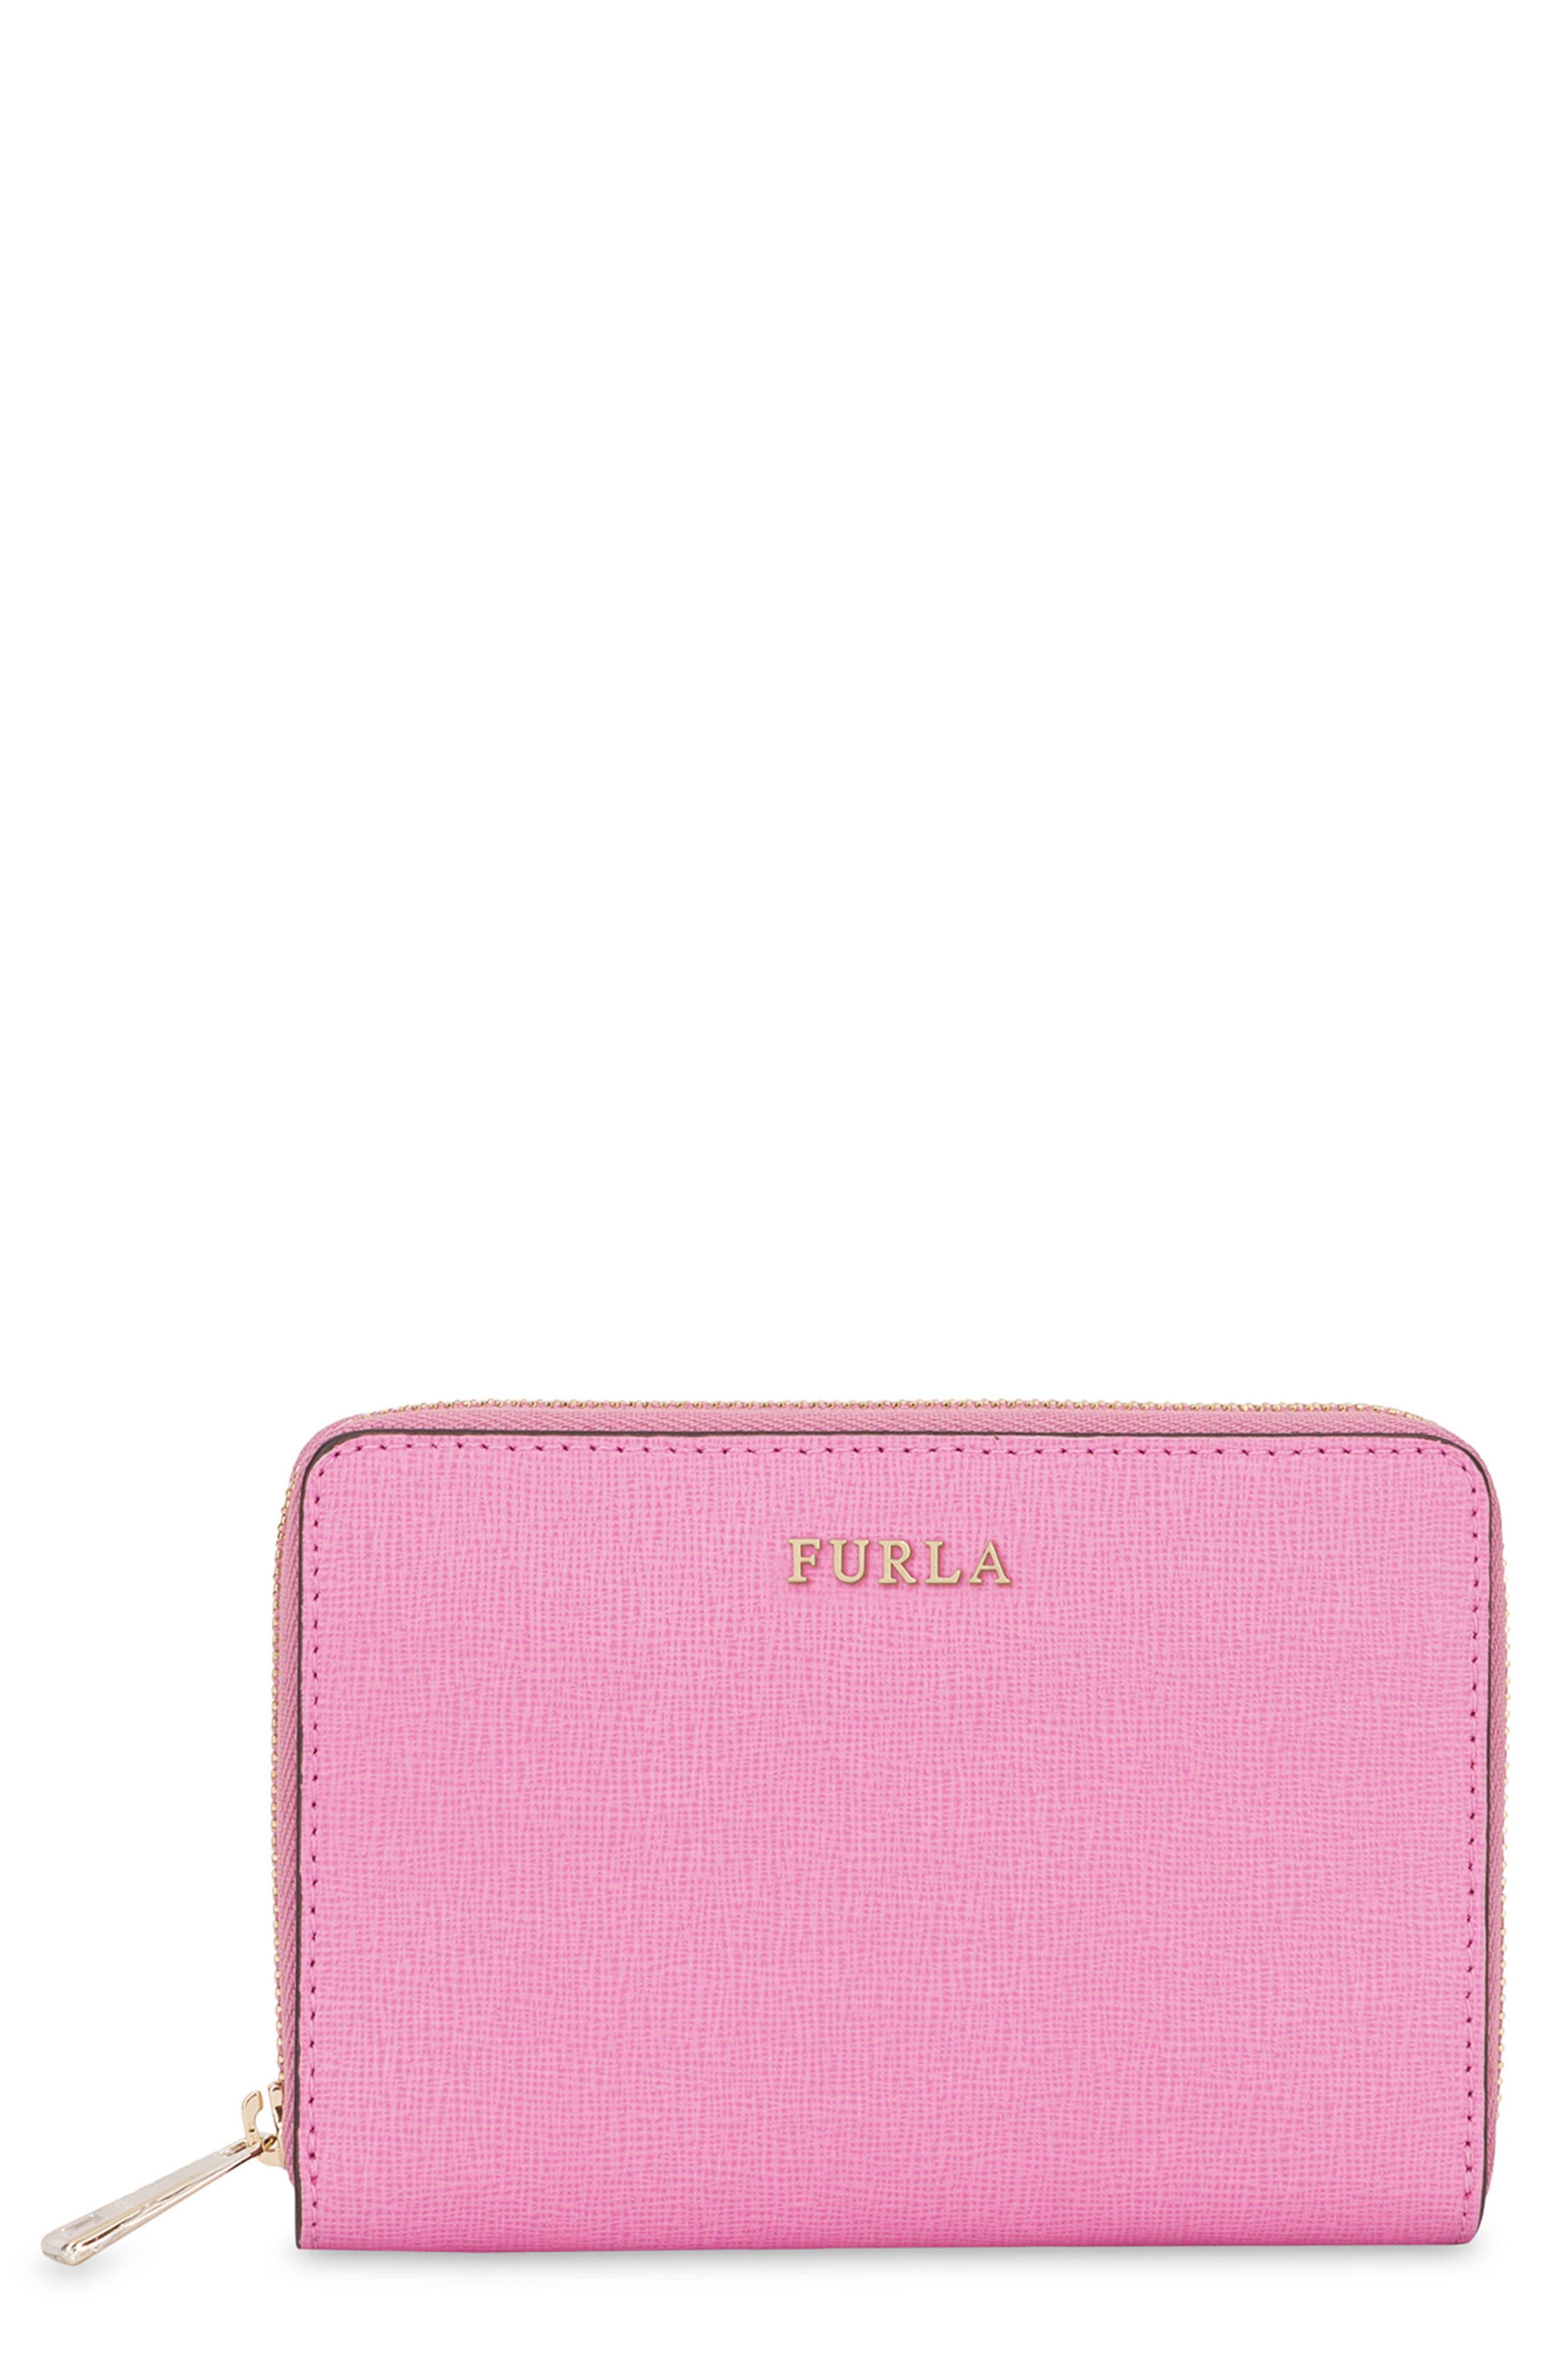 Medium Babylon Saffiano Leather Zip Around Wallet,                             Main thumbnail 1, color,                             Orchidea